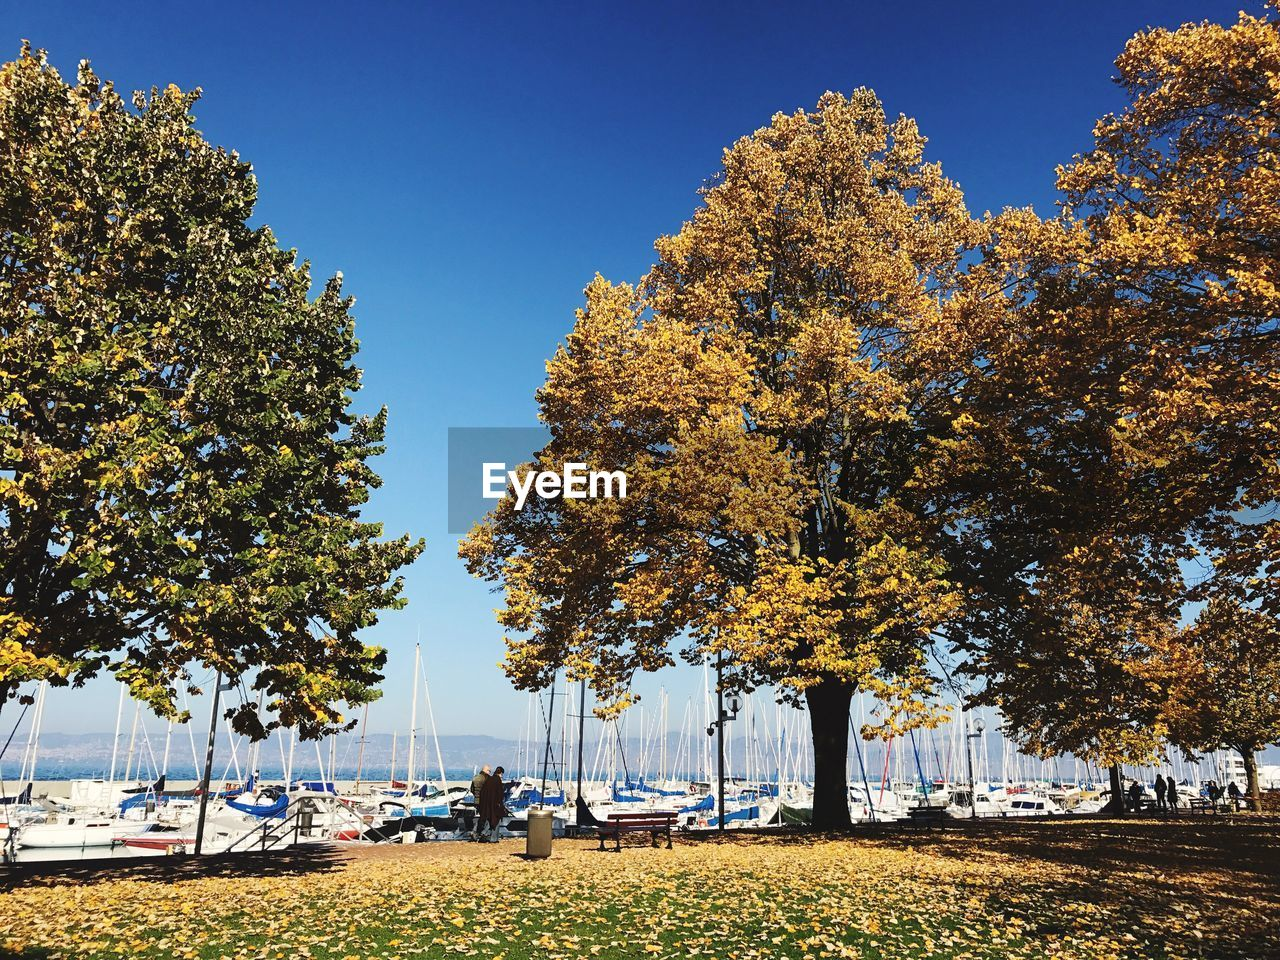 Autumn trees by harbor against blue sky